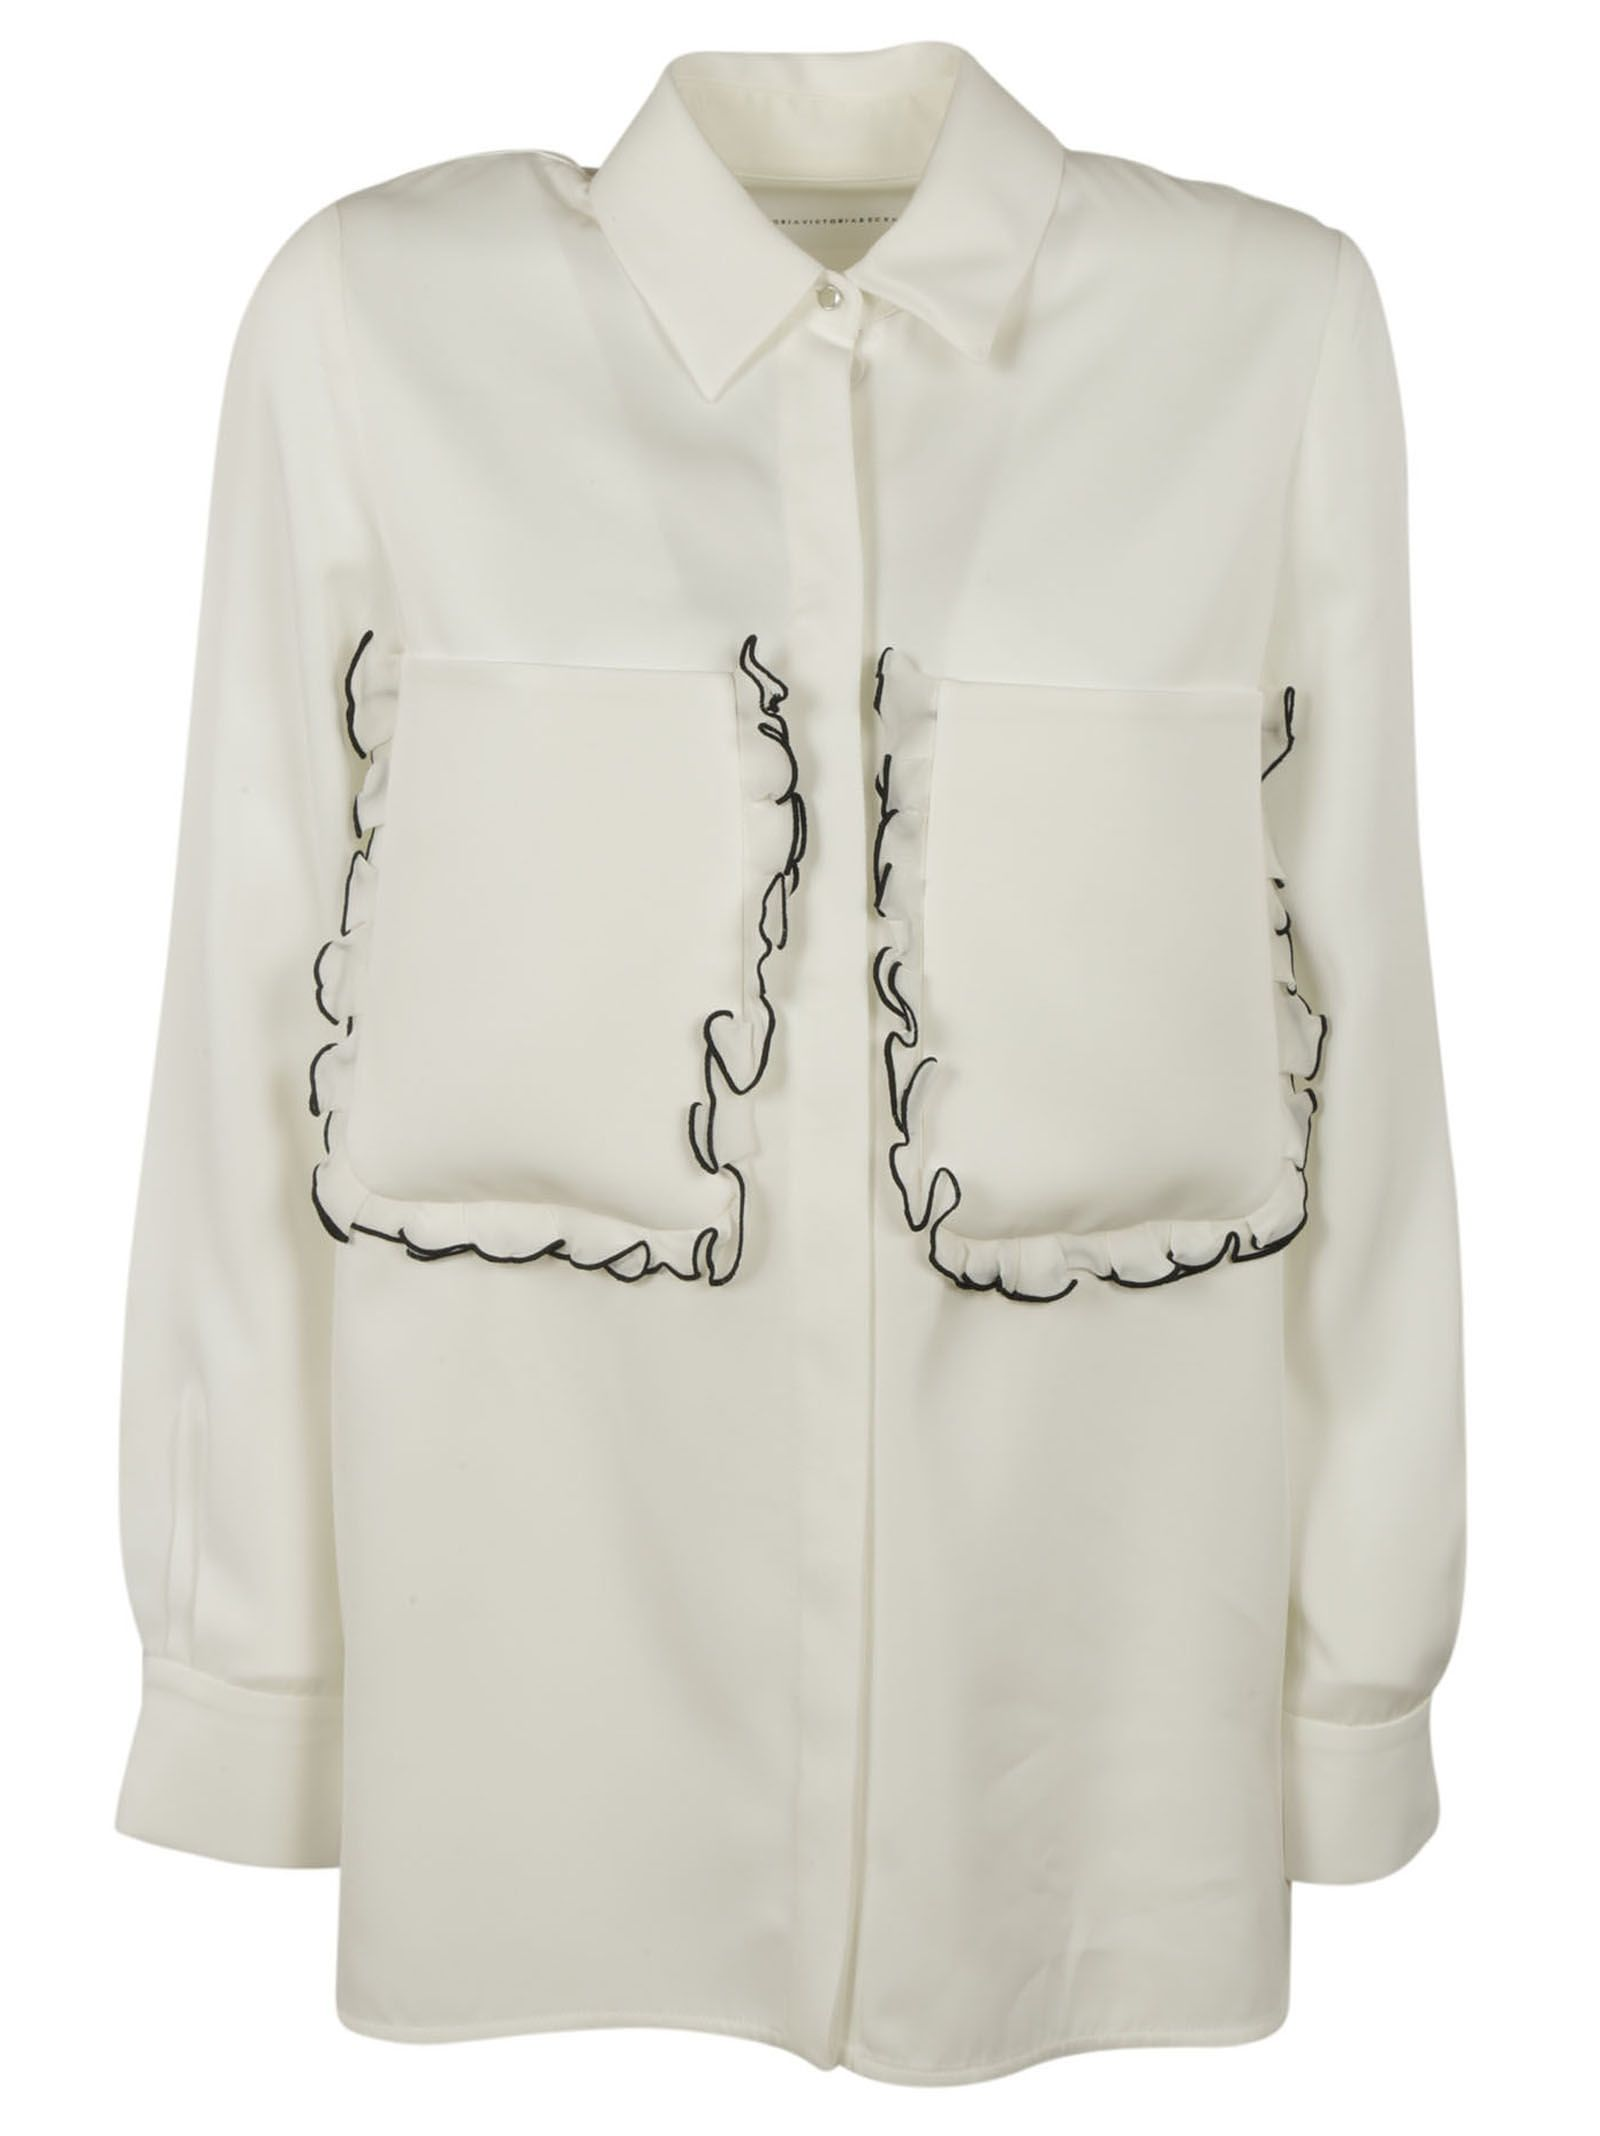 Victoria Beckham Victoria Beckham Ruffle Shirt Ivory